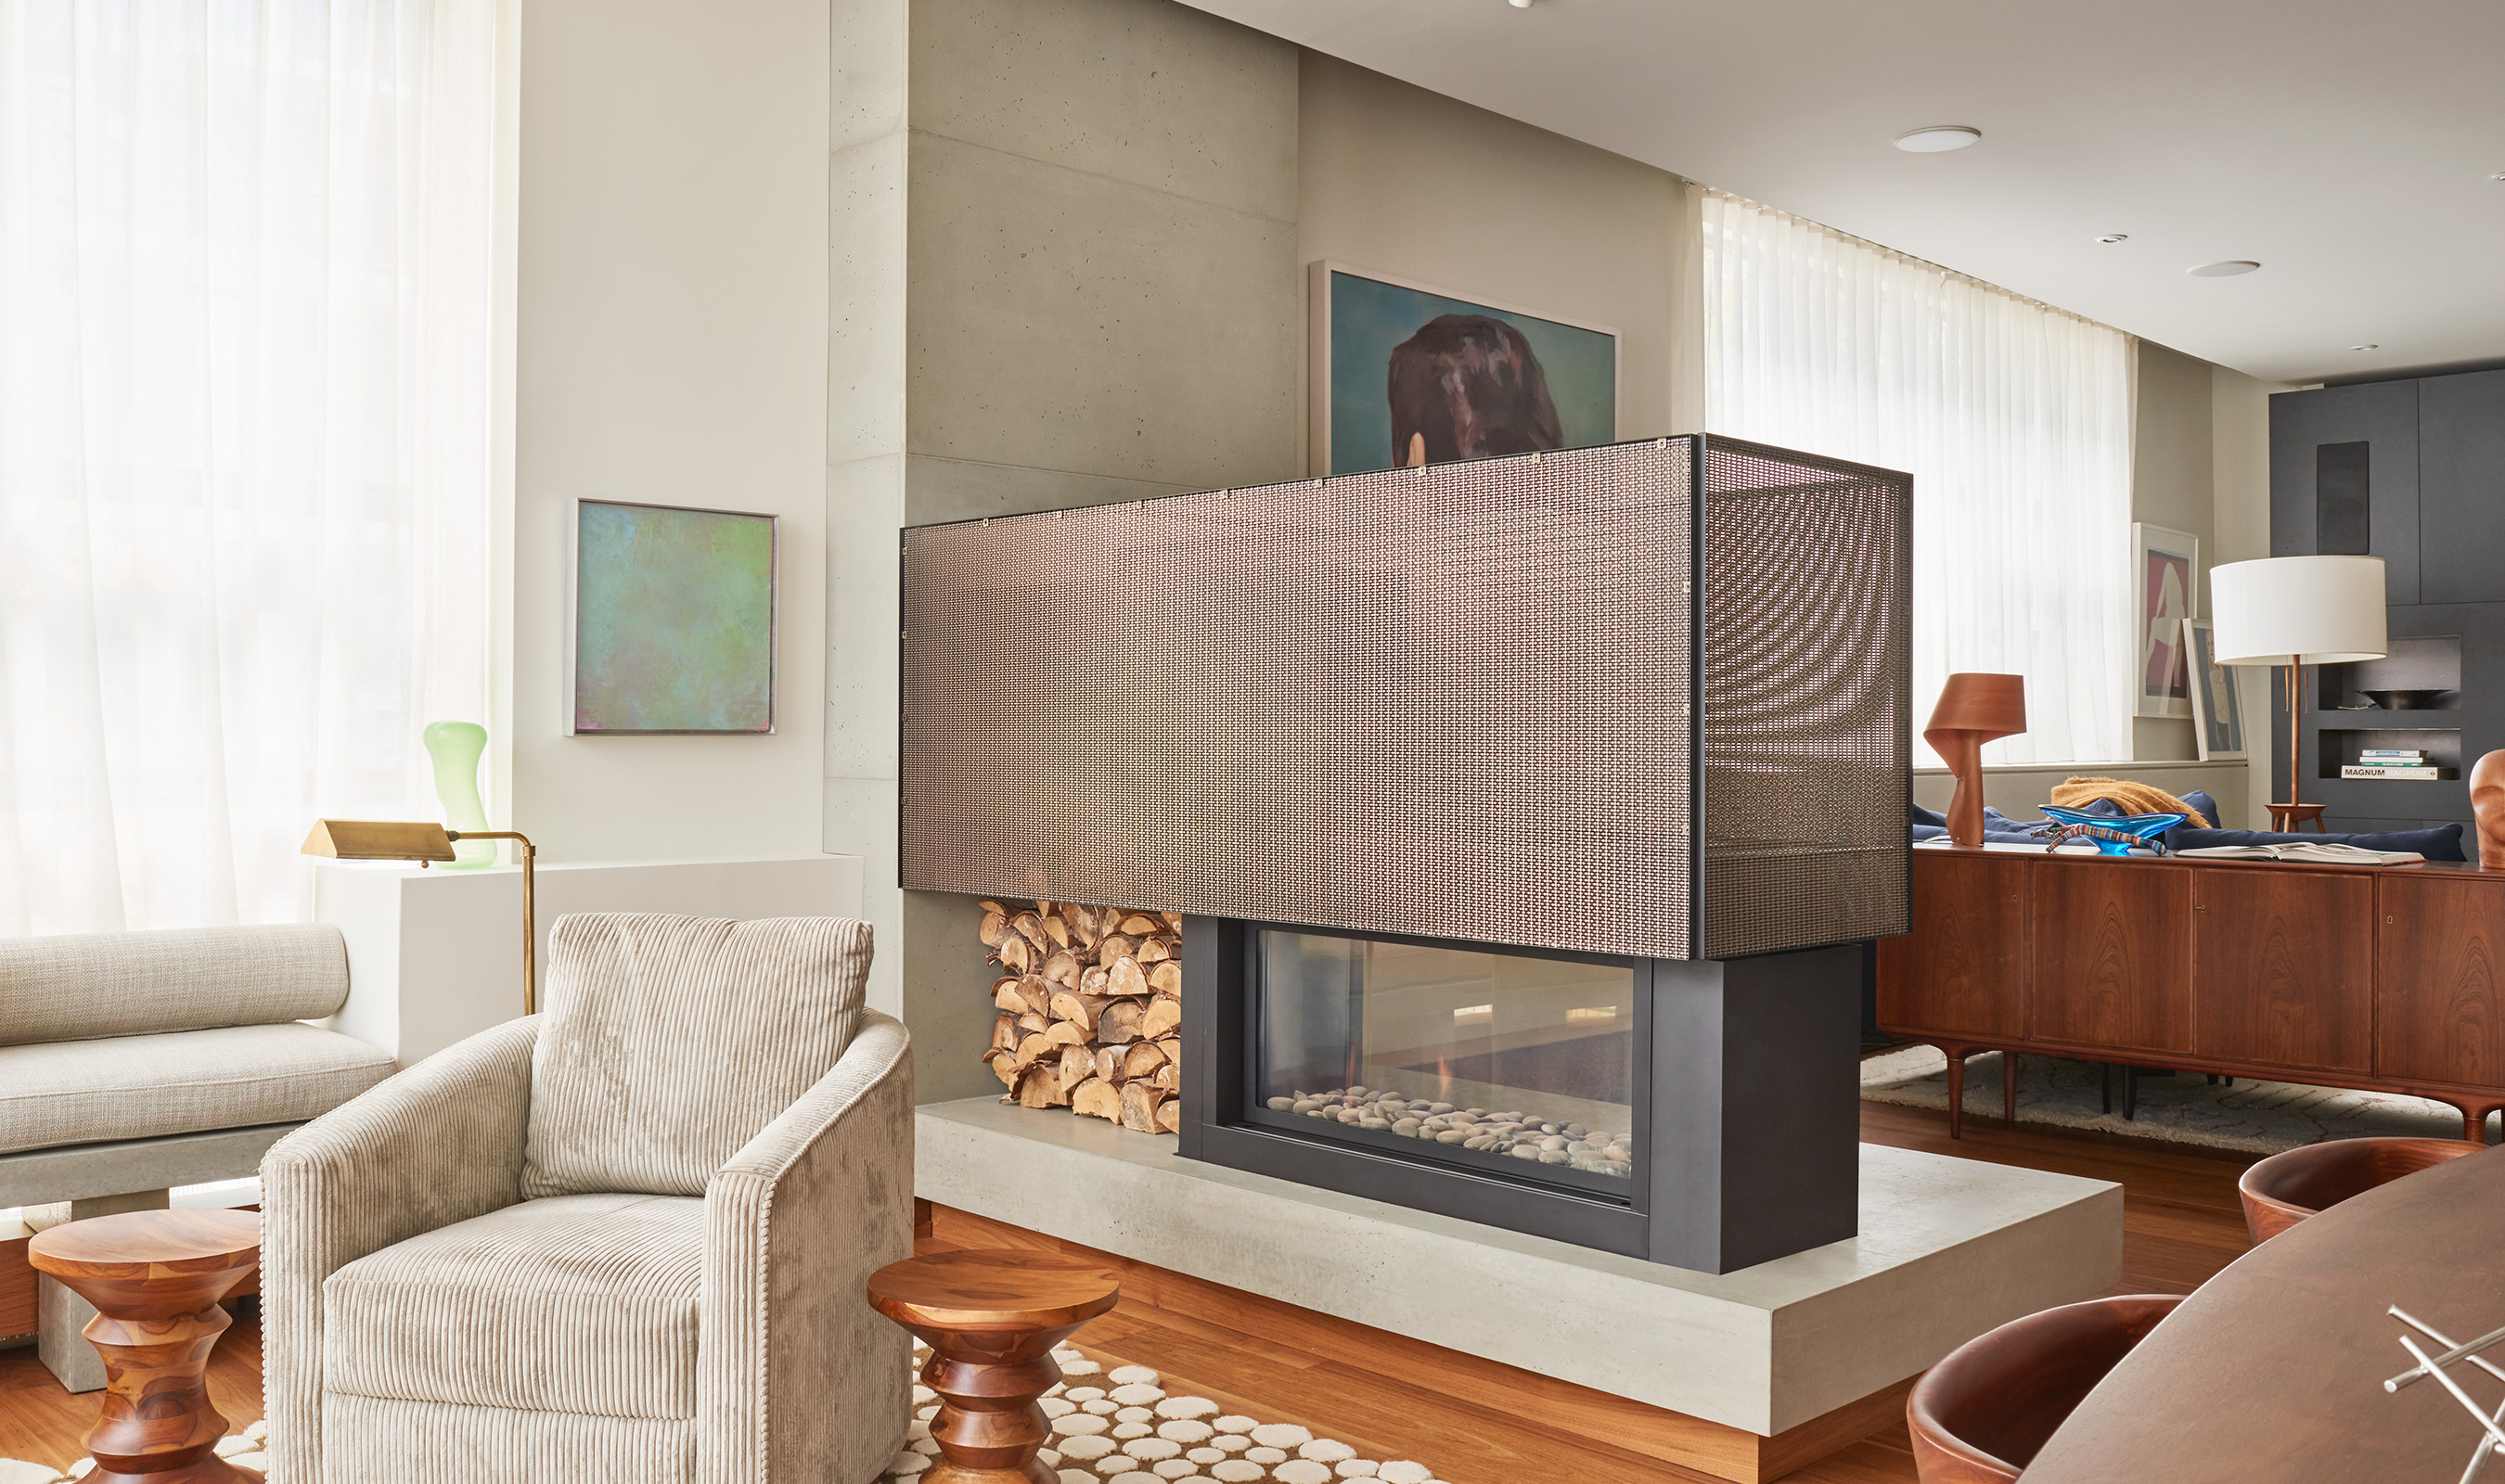 SZ-3 Plated Fireplace